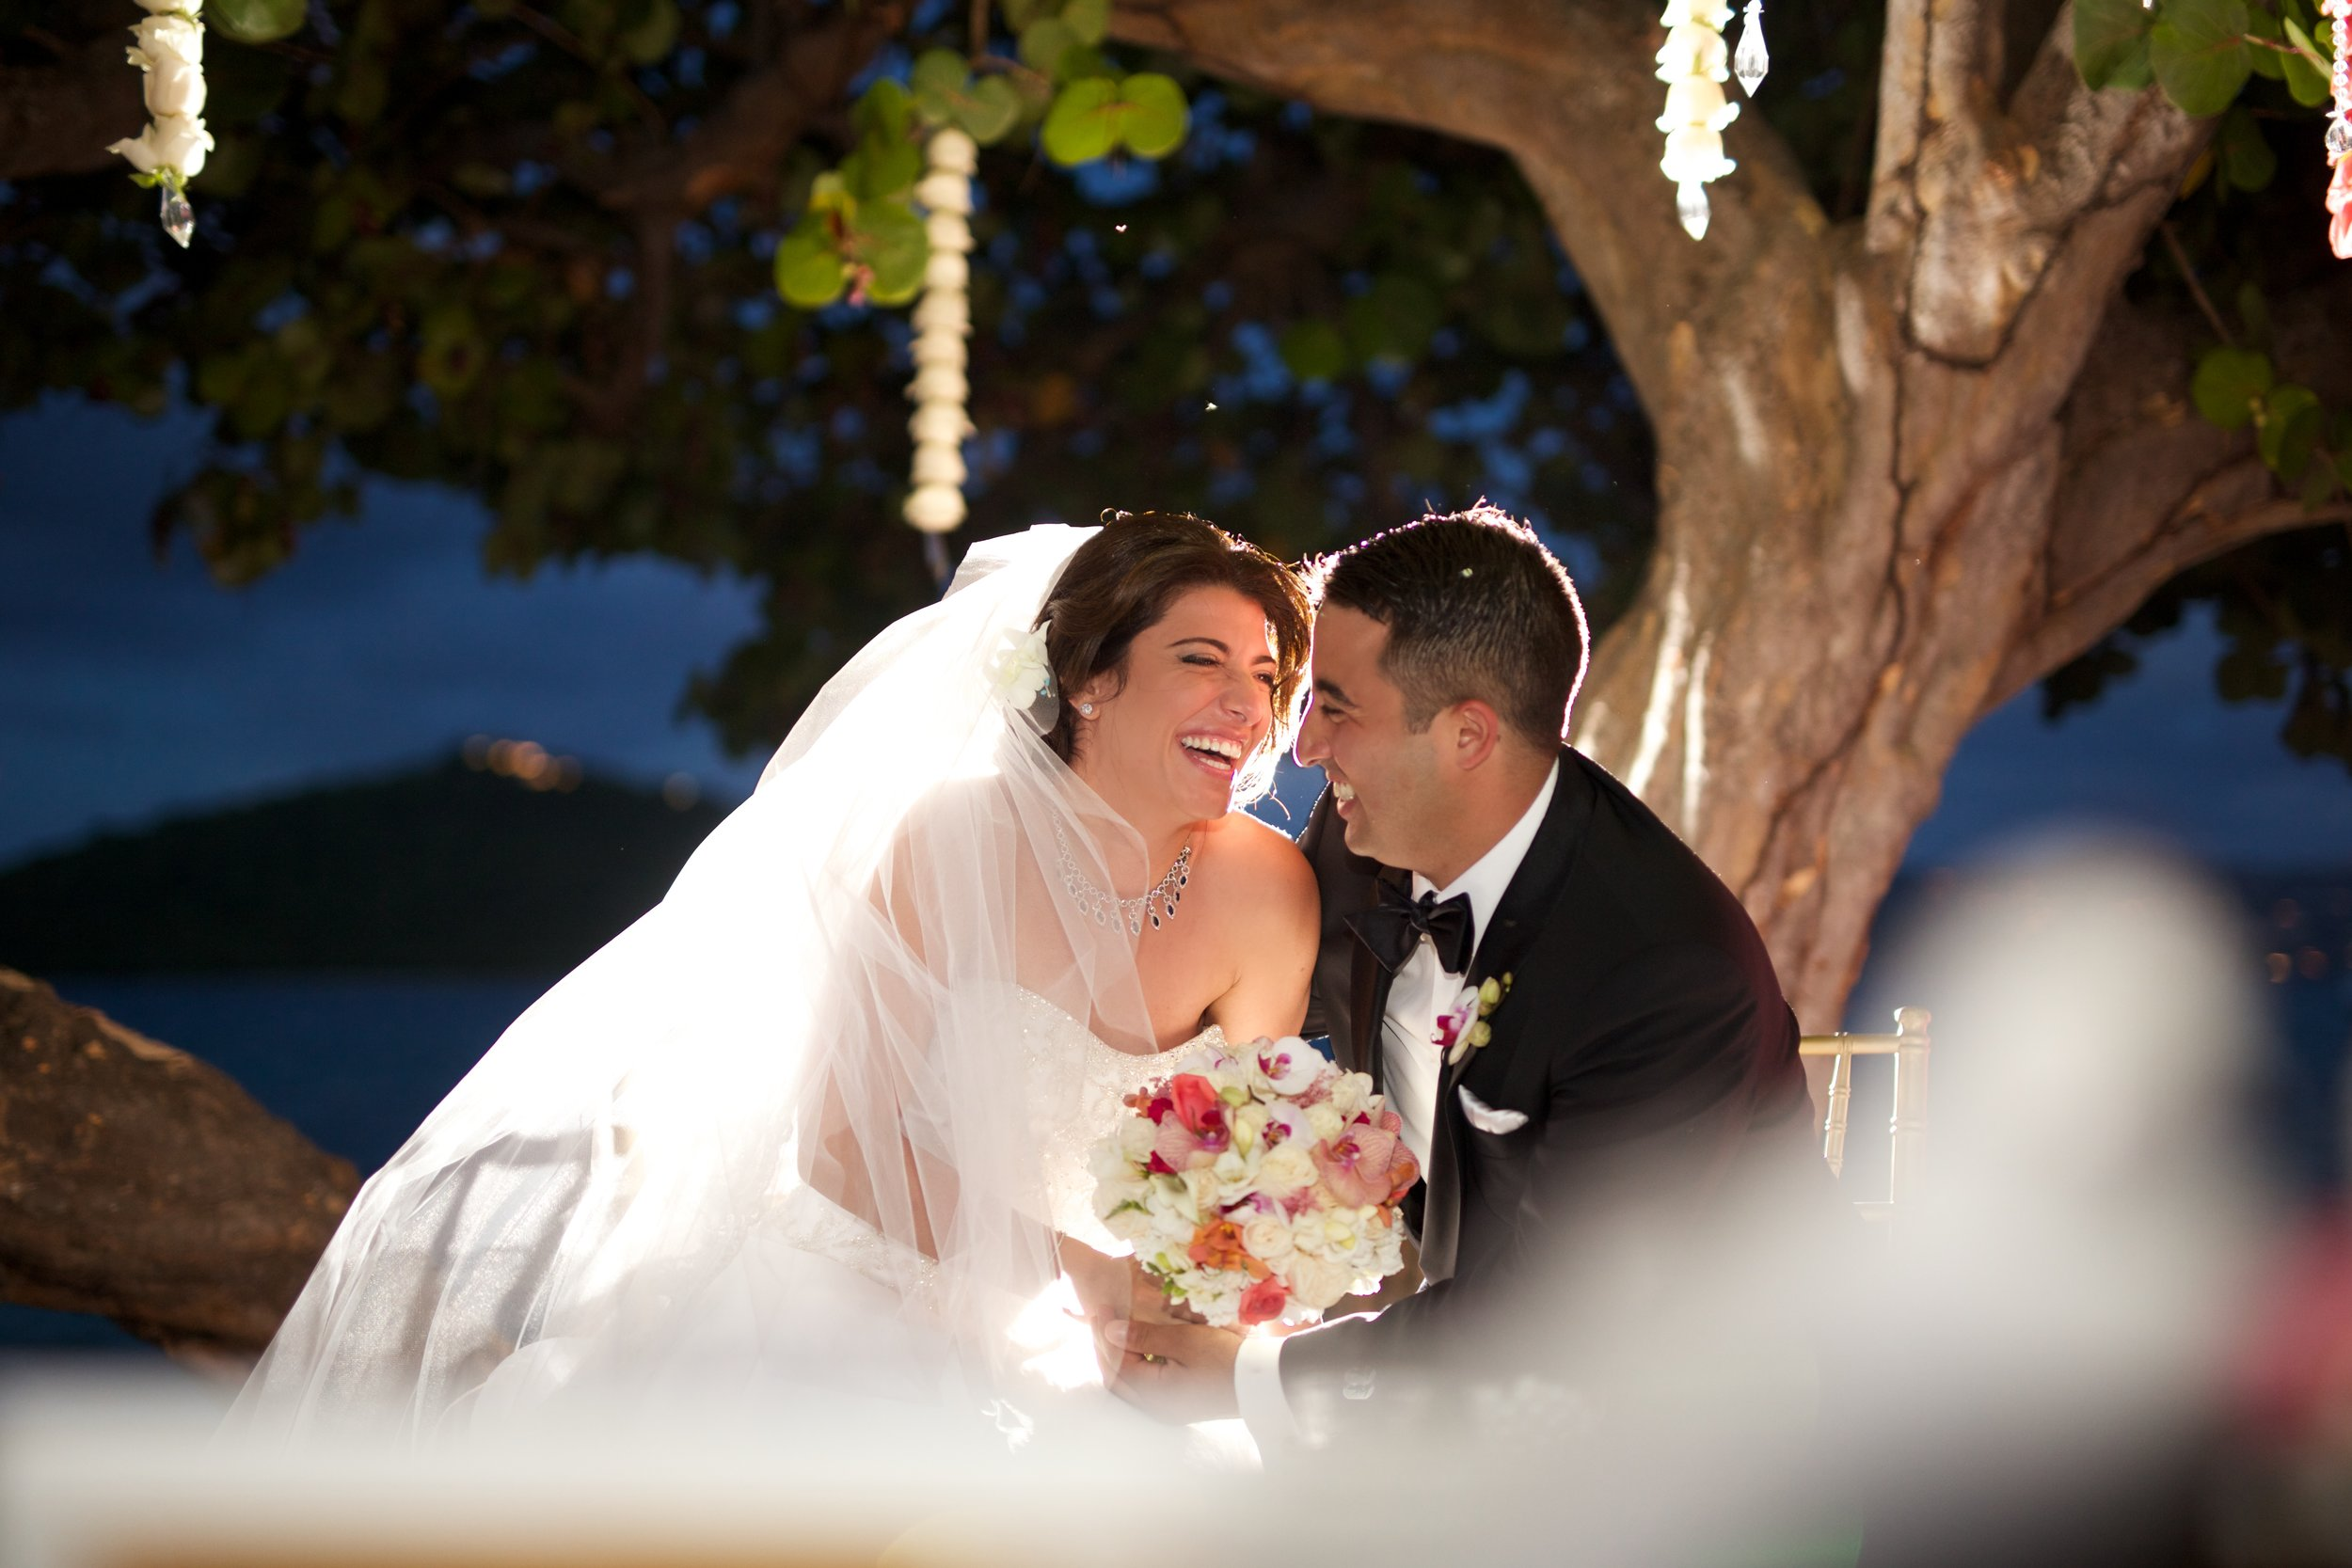 Le Cape Weddings - The Ritz Carlton Saint Thomas VA Wedding - Hesam and Mahsa  Day 3  2841.jpg